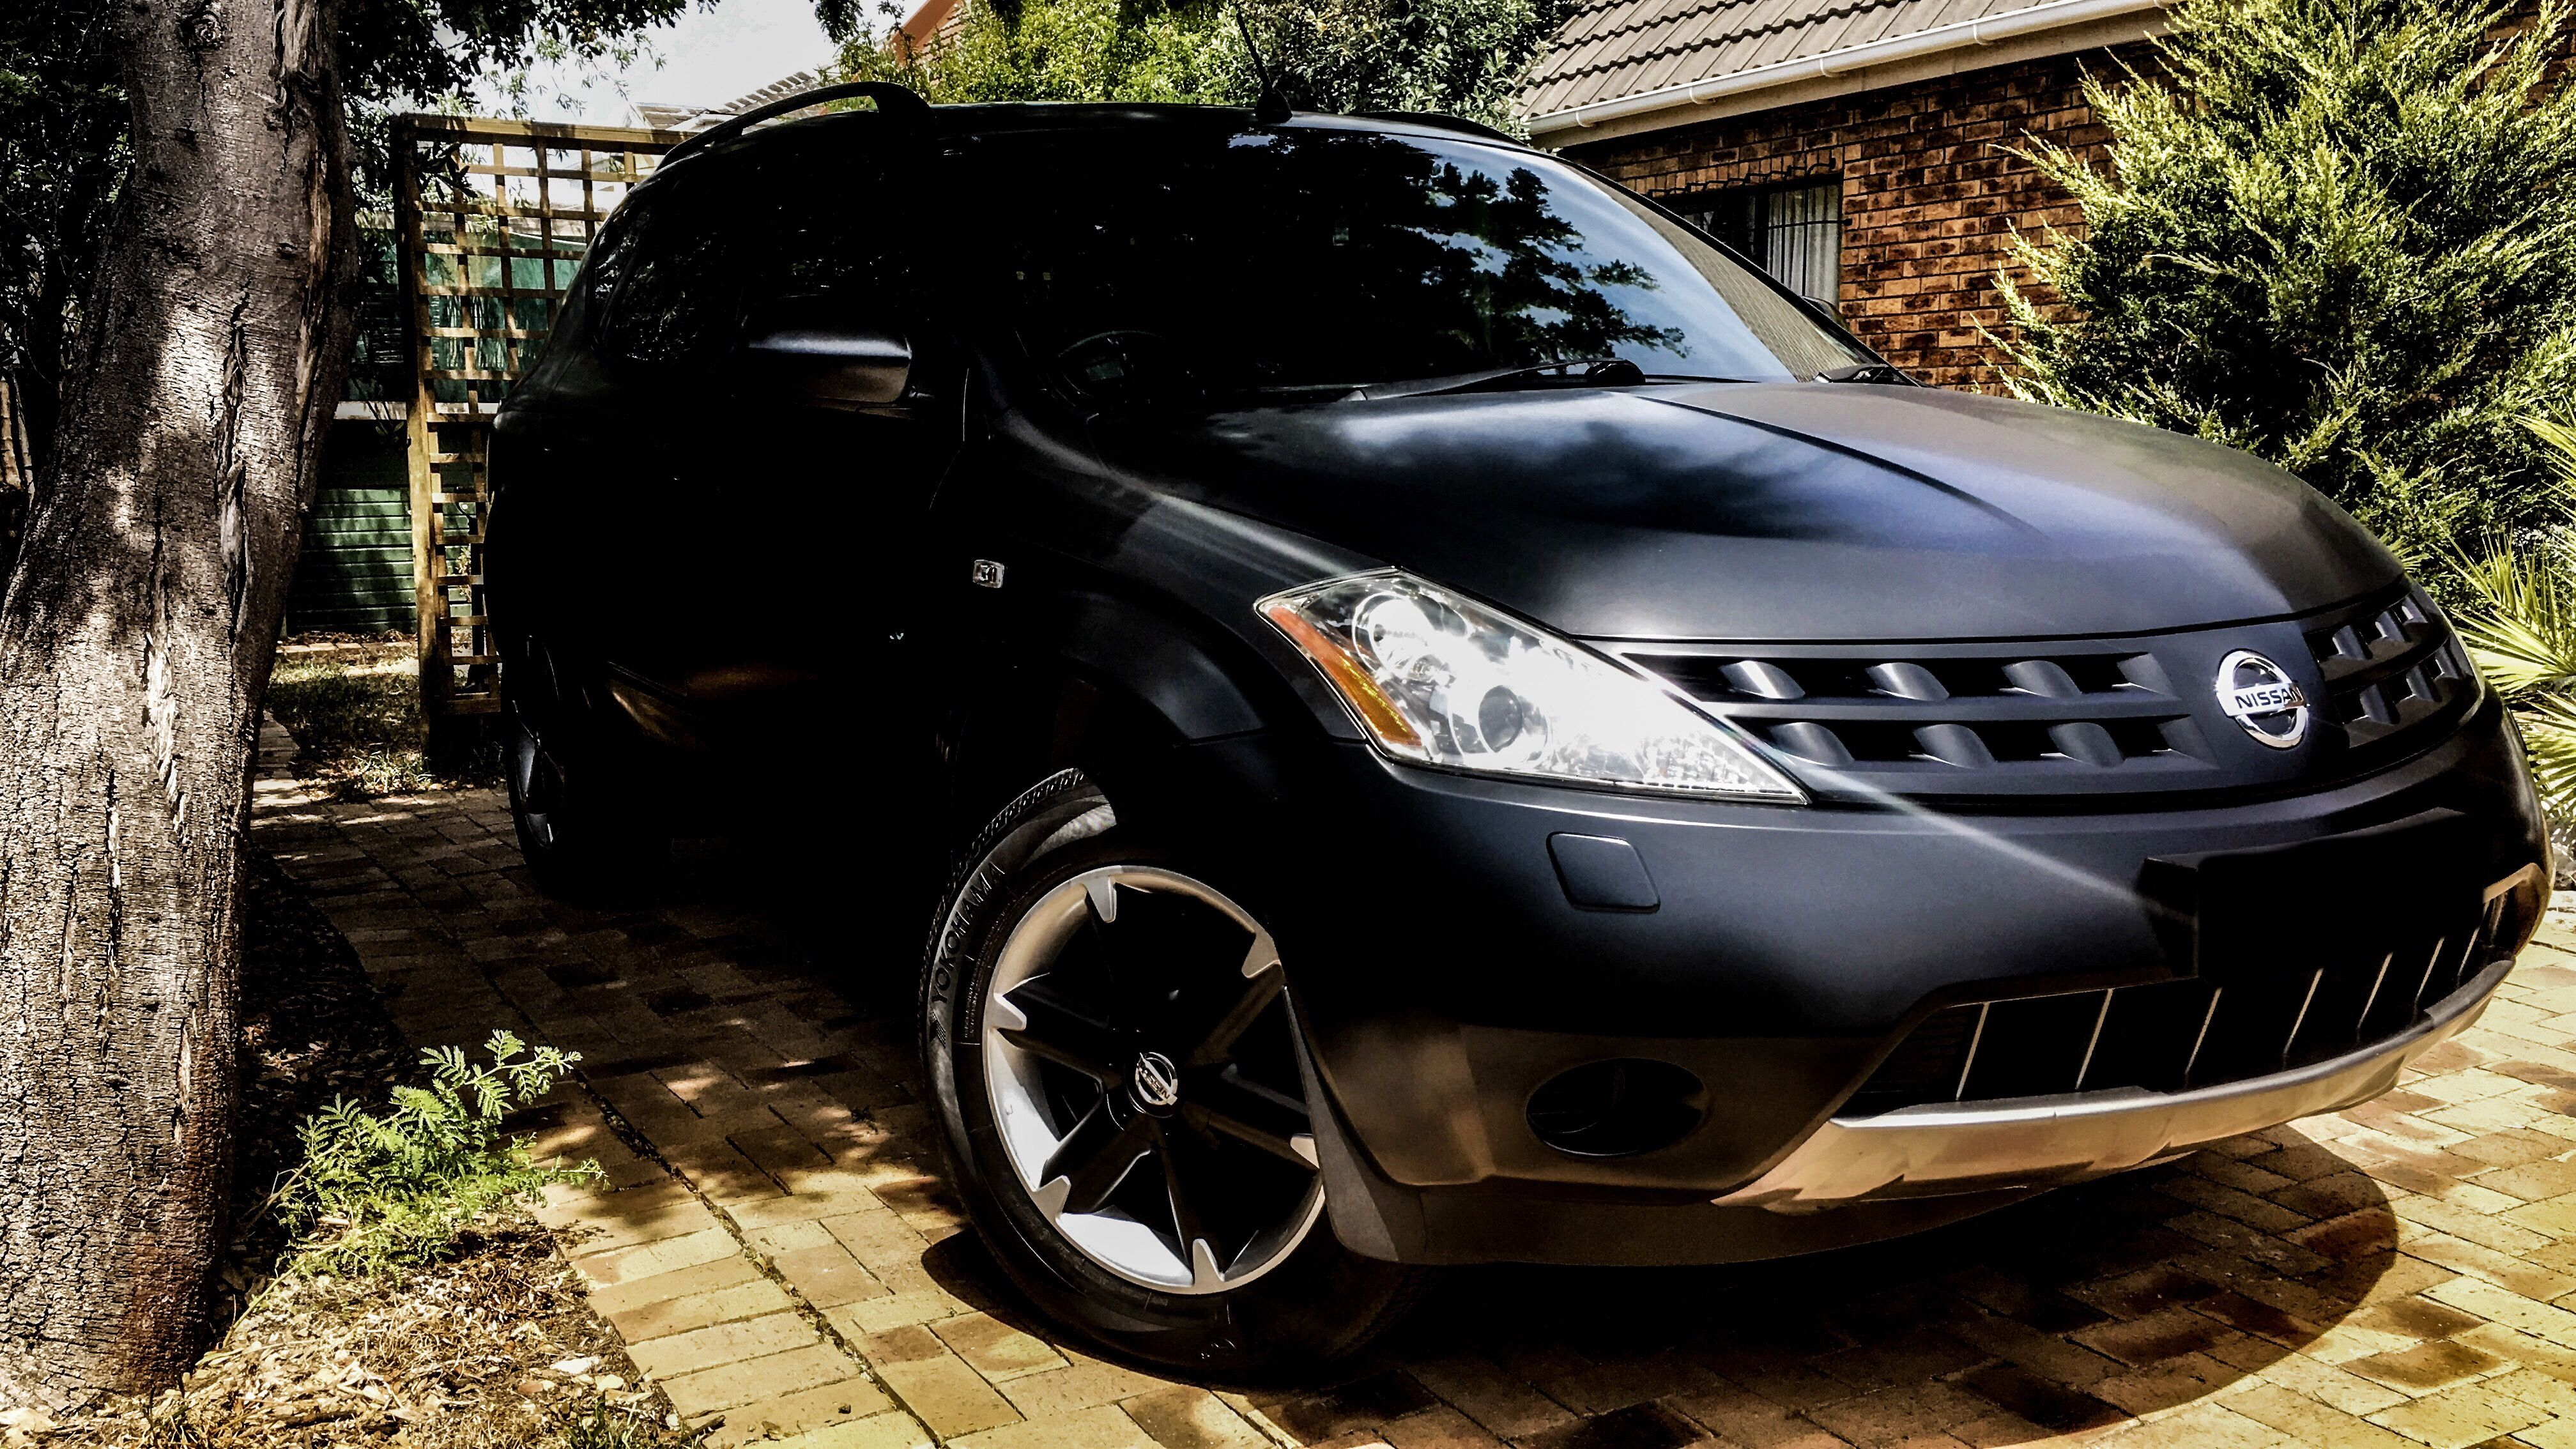 Nissan Murano BMWFrozenPaints FrozenBlack MatteBlack